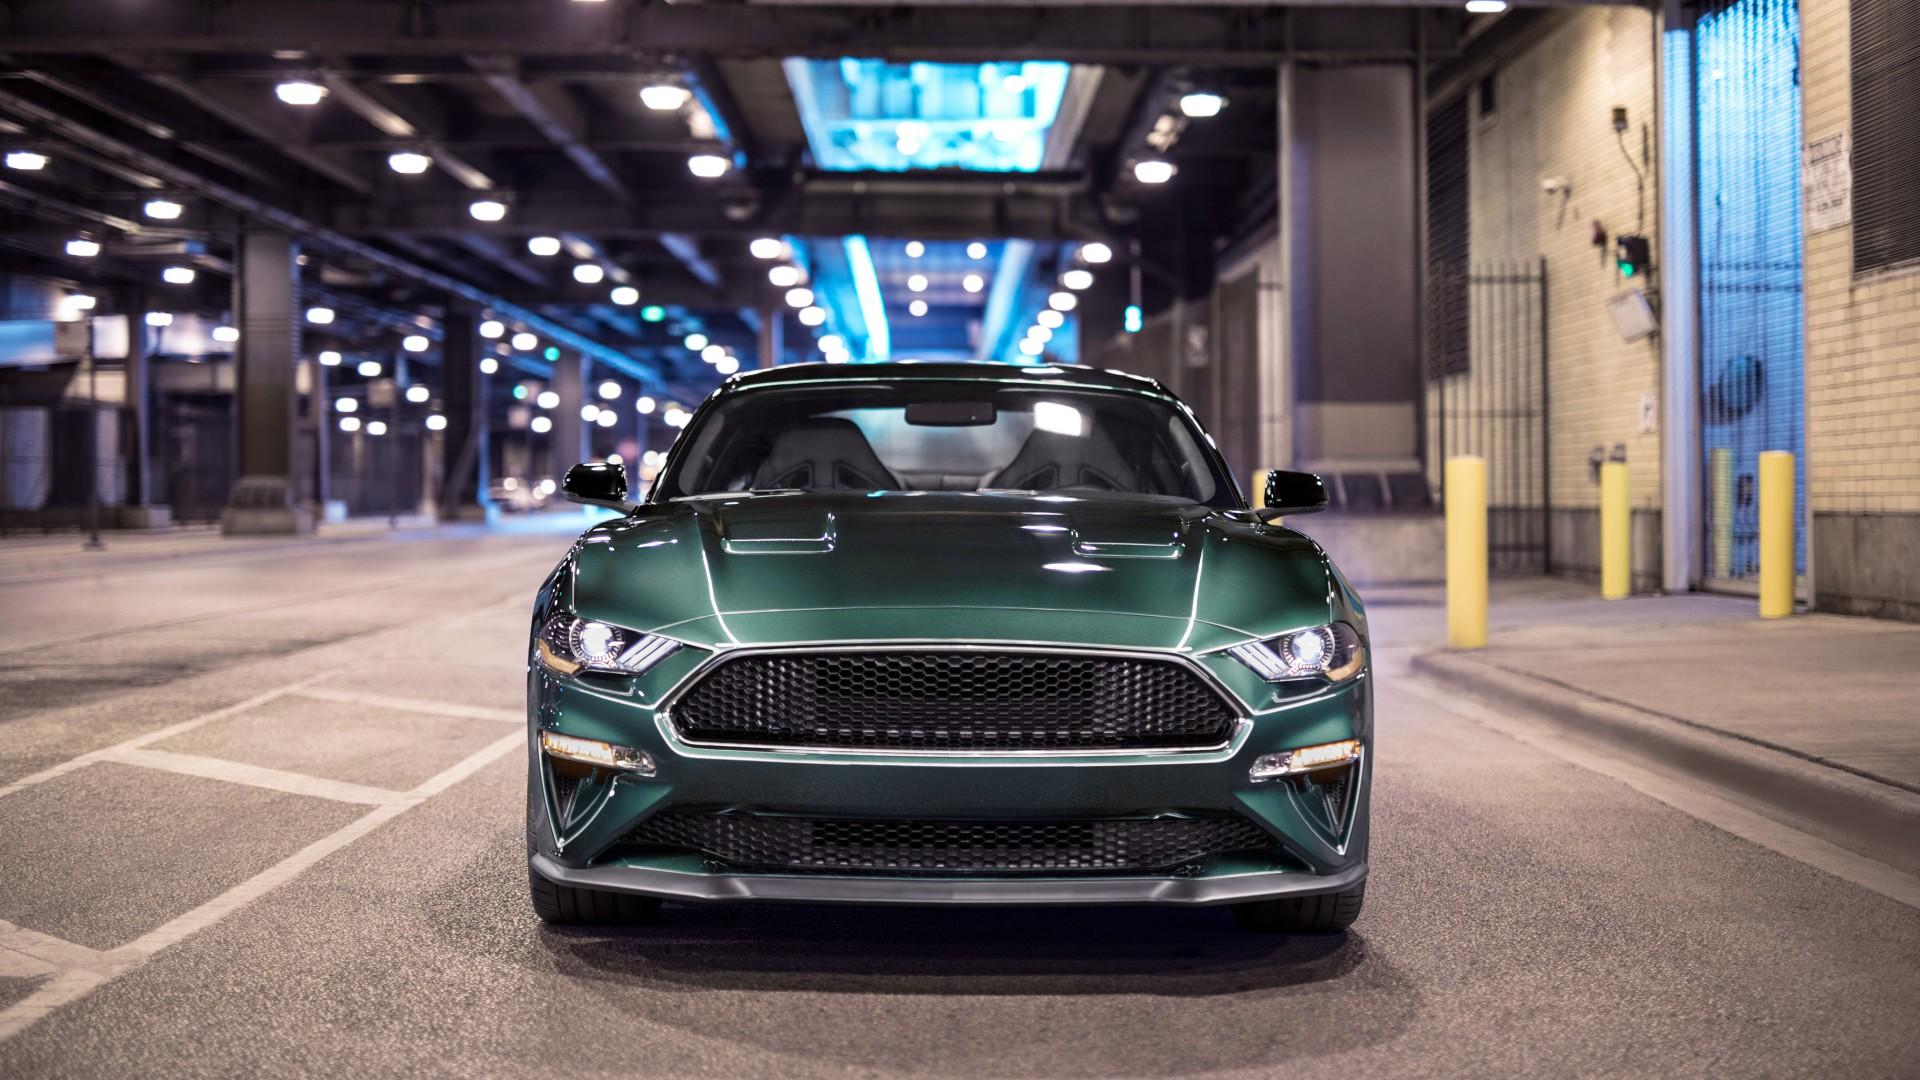 2018 Ford Mustang Bullitt 4k Wallpaper Hd Car Wallpapers